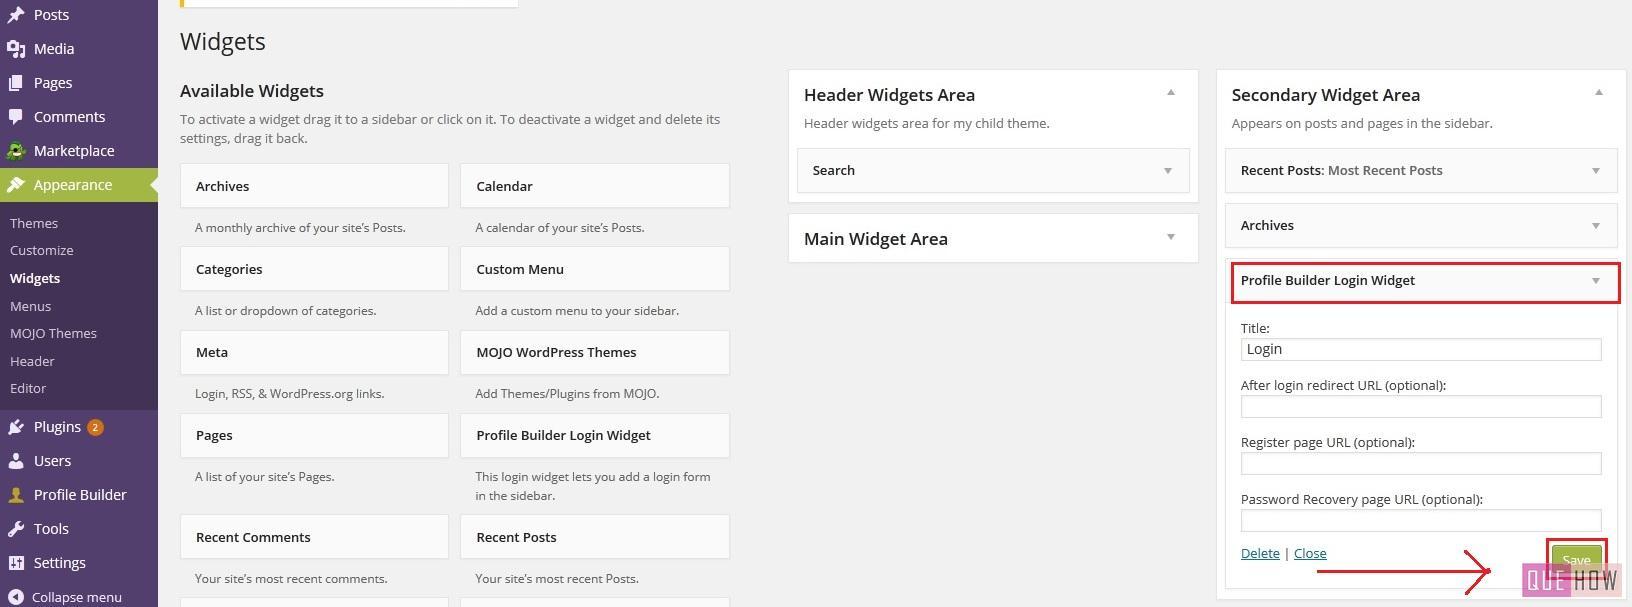 how-to-add-custom-registration-login-form-in-wordpress-using-a-plugin-step17